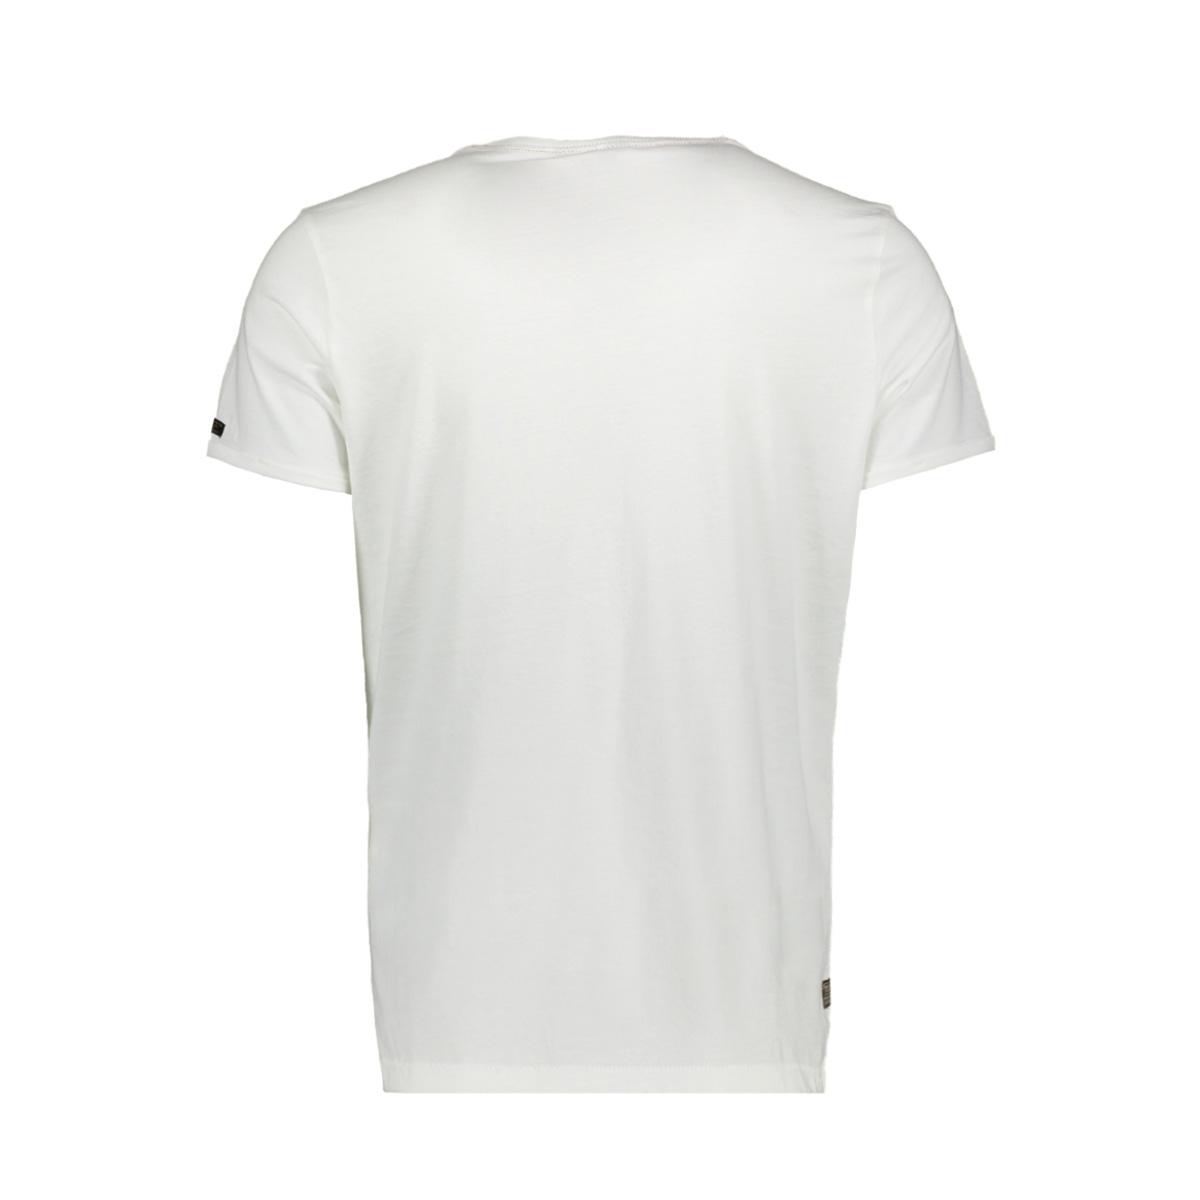 ptss191511 pme legend t-shirt 7072